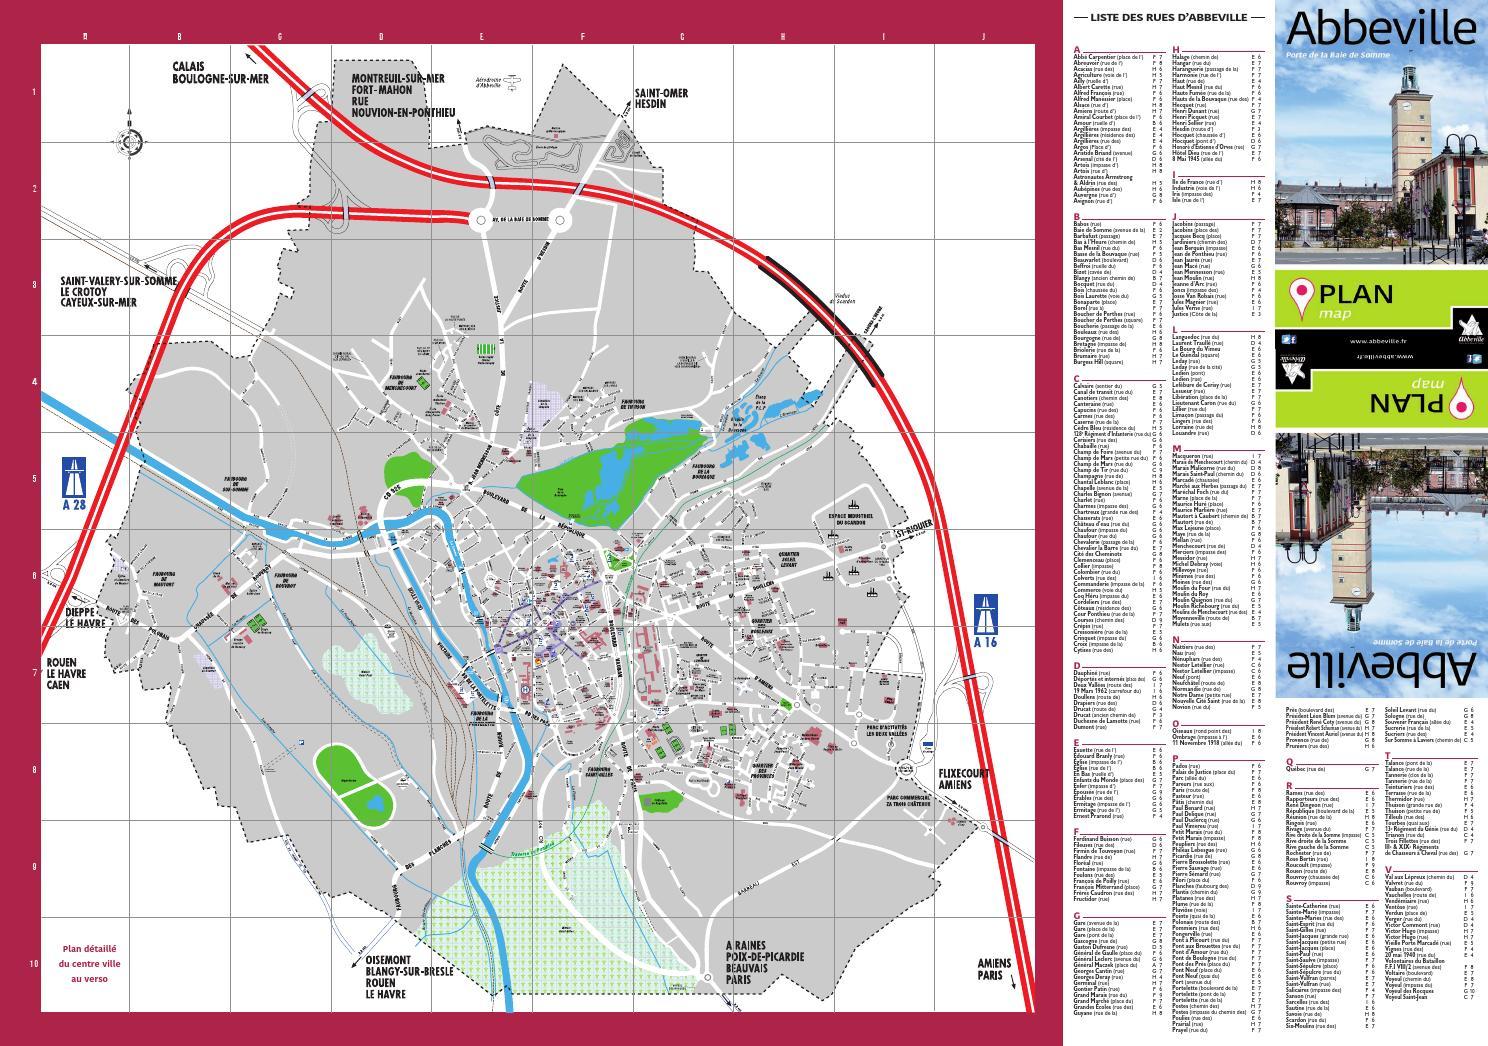 abbeville plan de ville by communication abbeville issuu. Black Bedroom Furniture Sets. Home Design Ideas